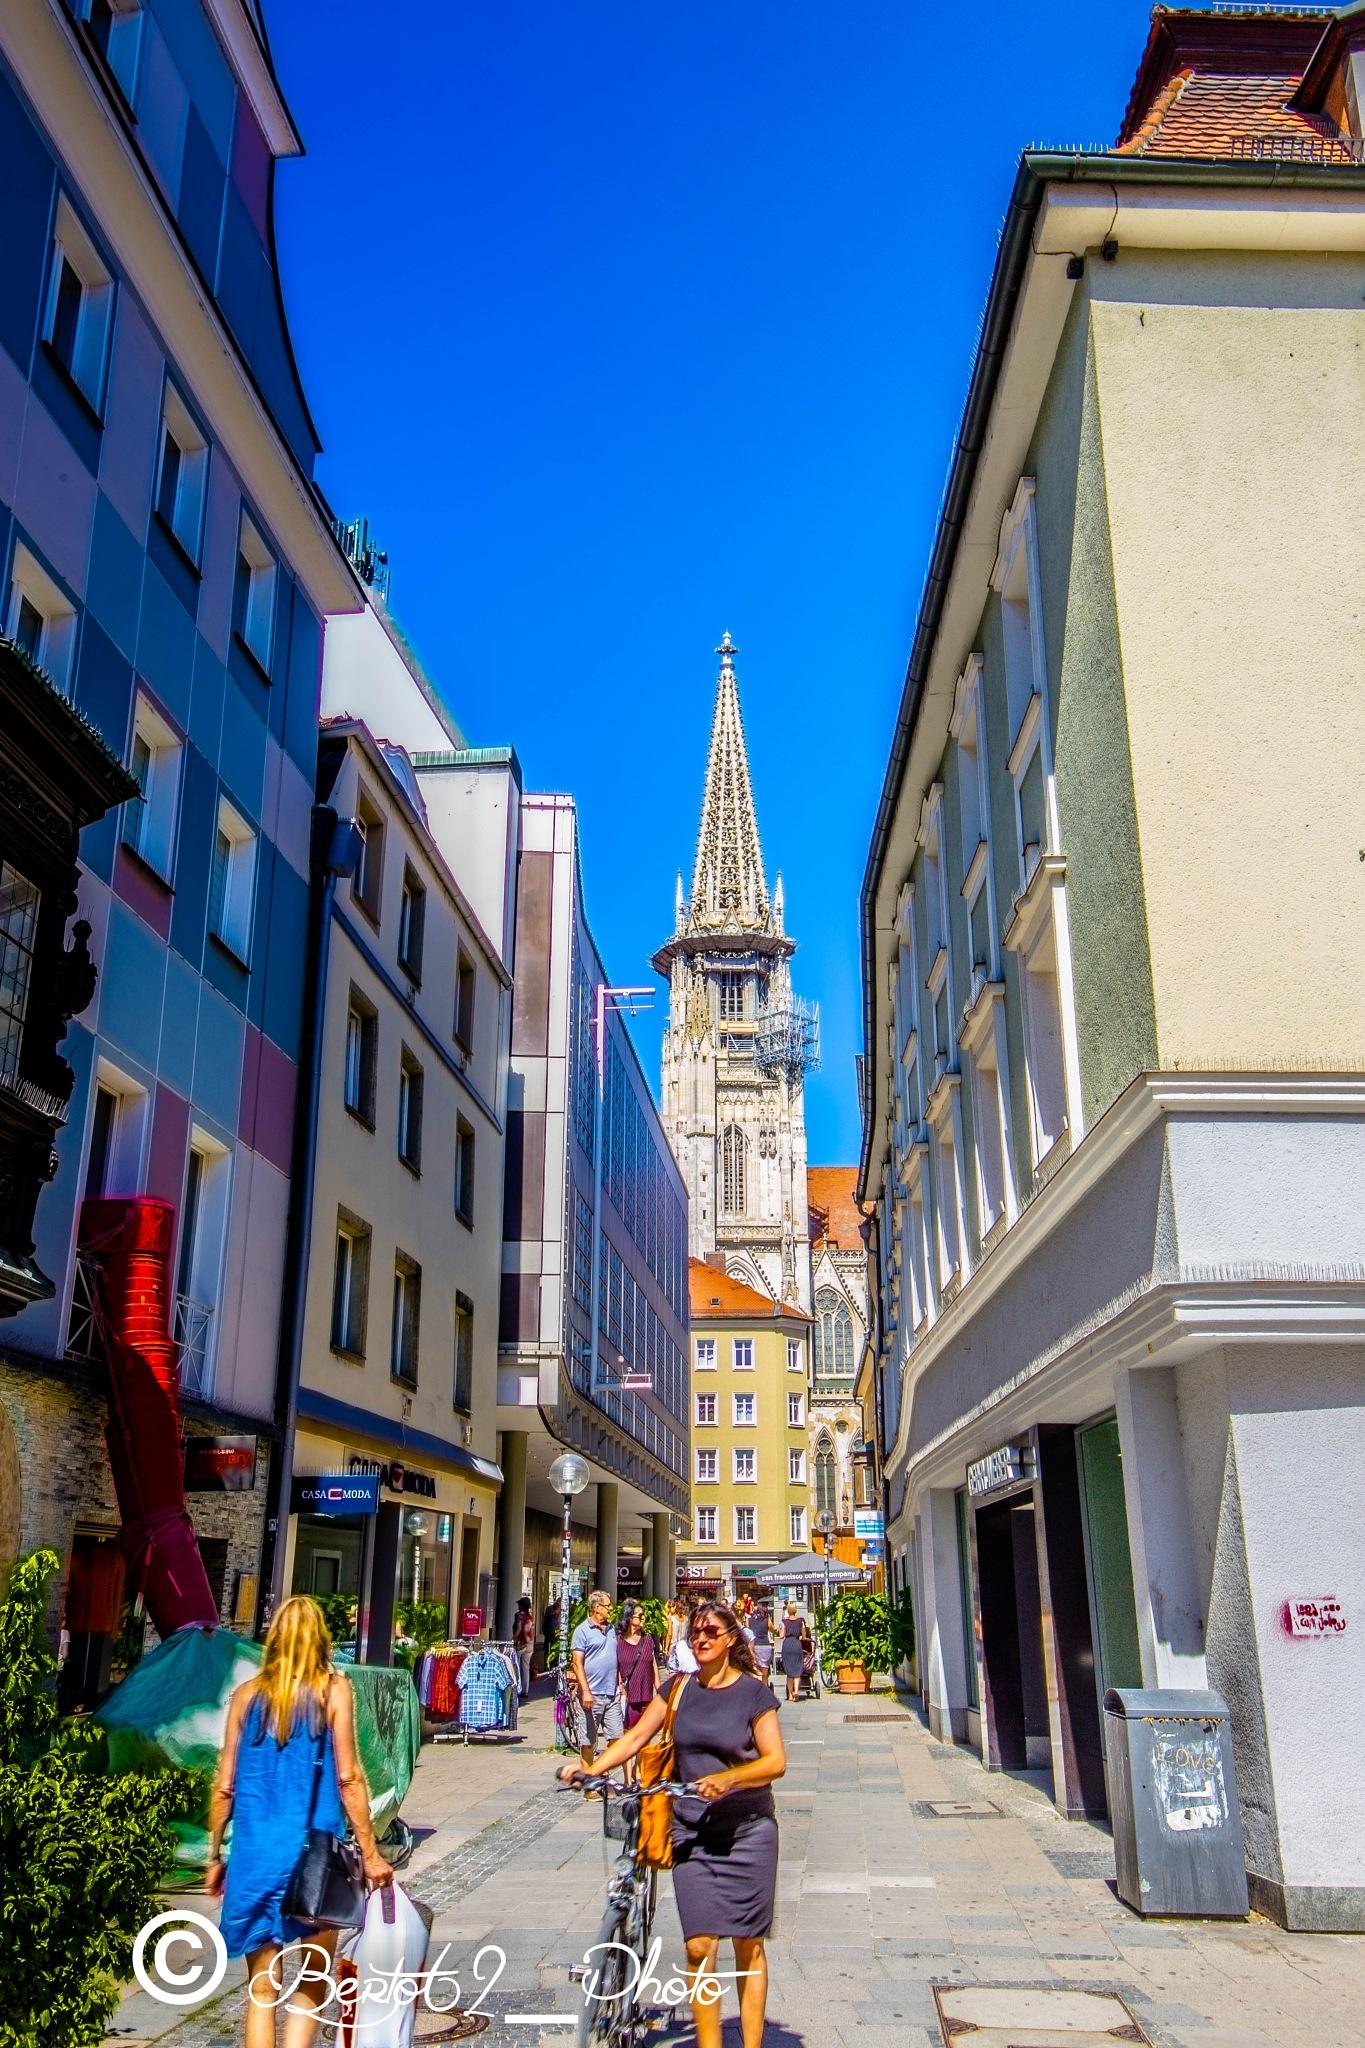 Regensburg by Bartolomeo Scanu